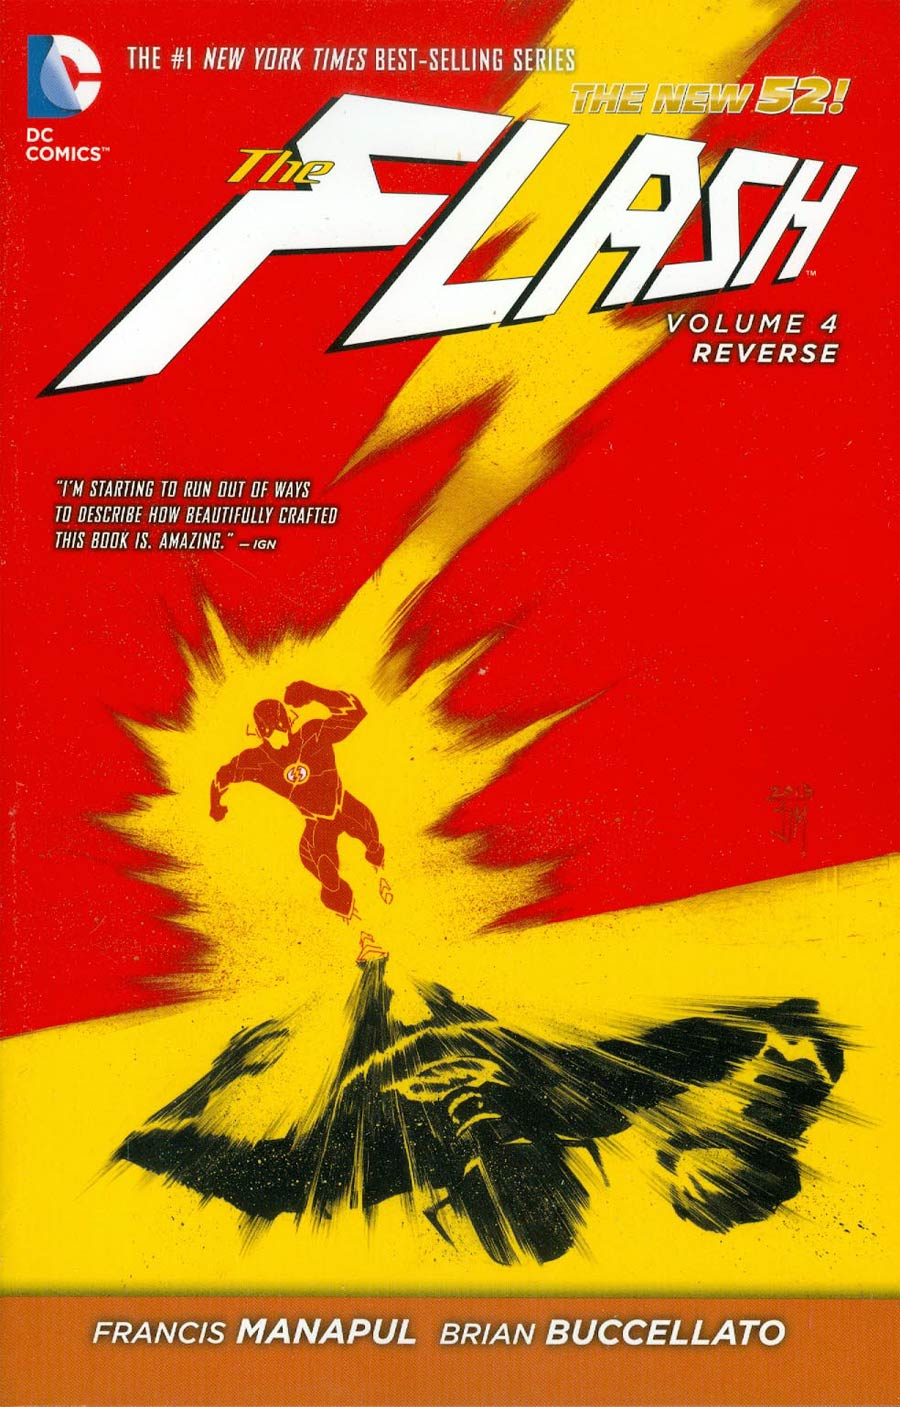 Flash (New 52) Vol 4 Reverse TP